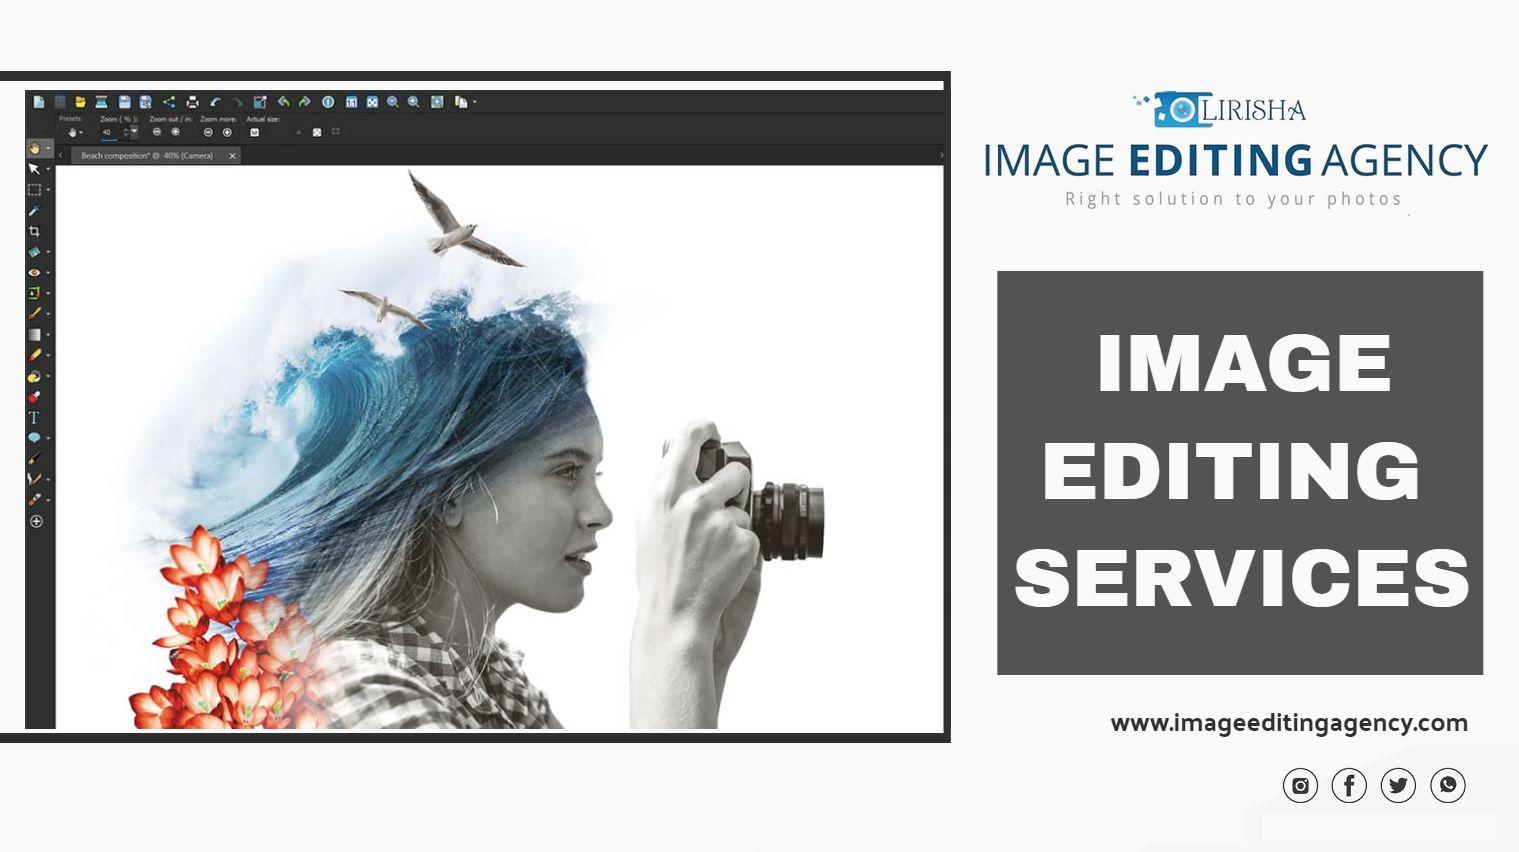 Image Editing Agency in USA | imageeditingagency.com